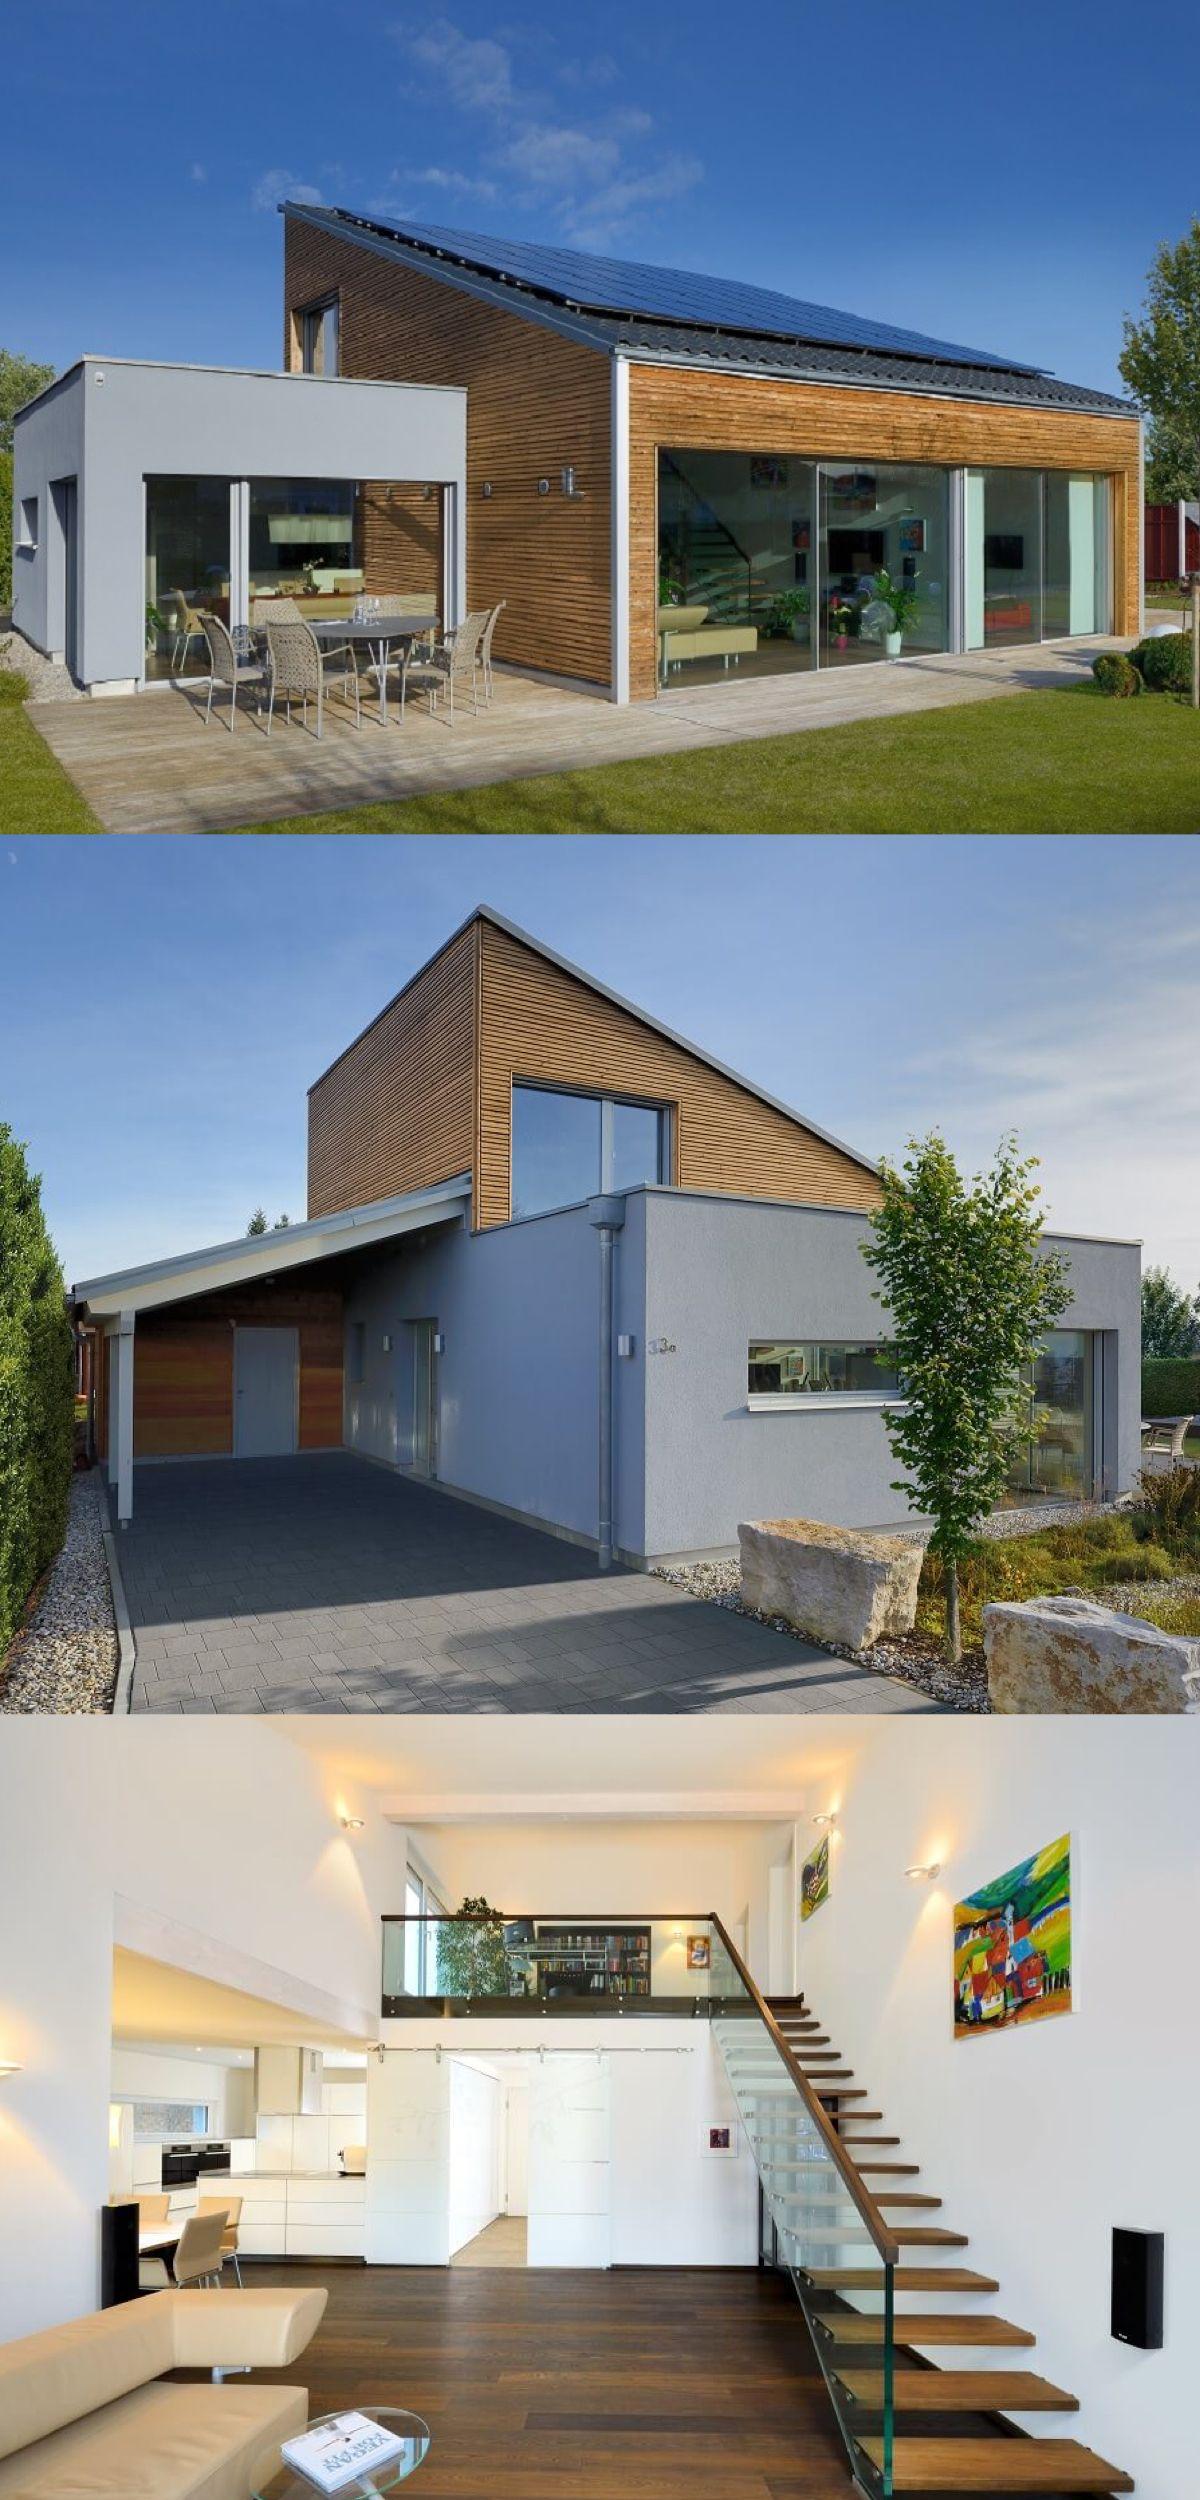 Anbau An Bungalow moderner bungalow mit pultdach haus ederer baufritz